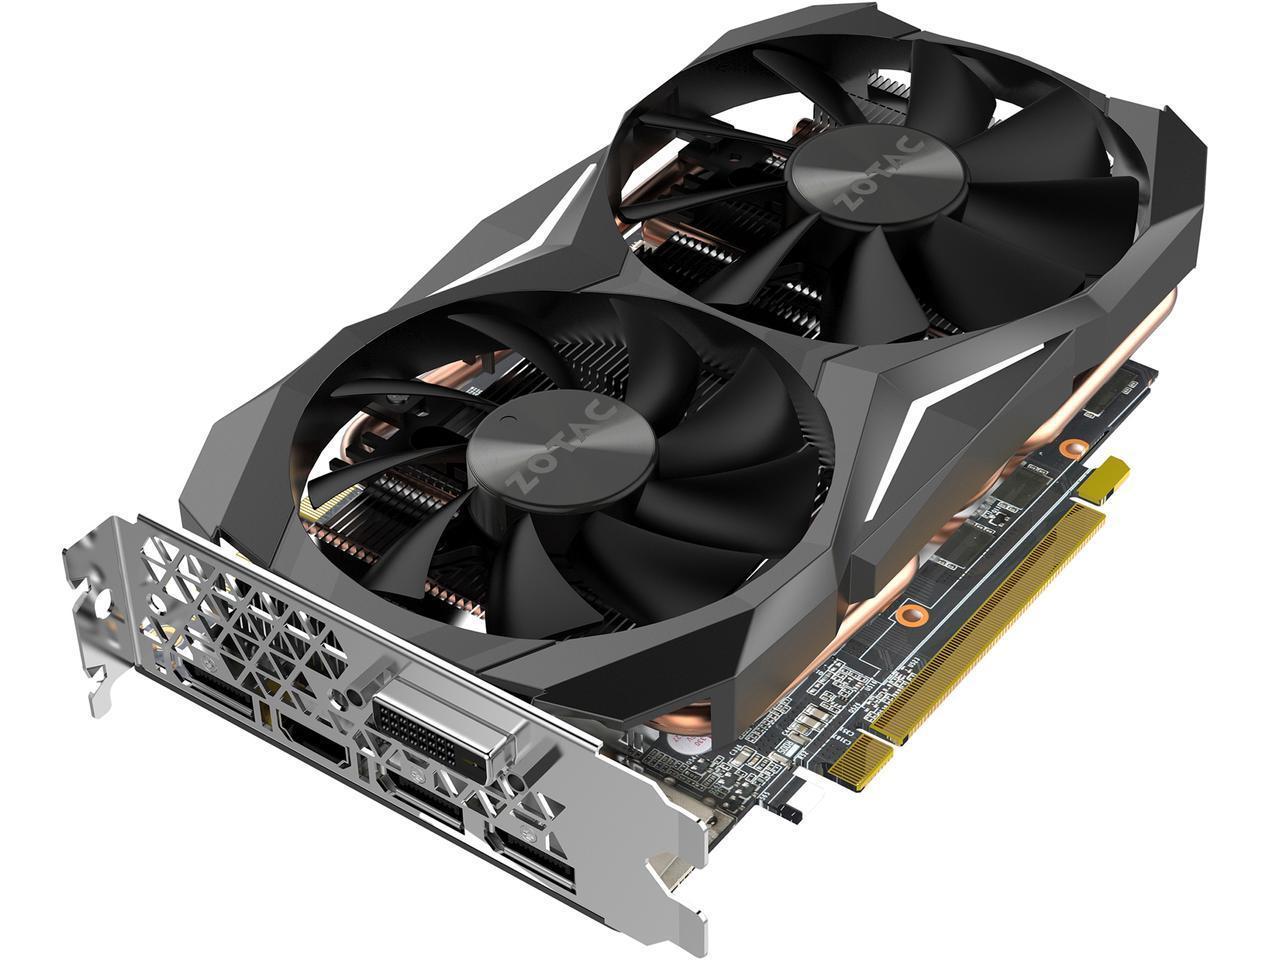 ZOTAC GeForce GTX 1080 Mini 8GB 256-Bit GDDR5X IceStorm Dual-Fan Cooling PCI-E 3.0 Video Card for $499.99 AR + Free Ship @ Newegg